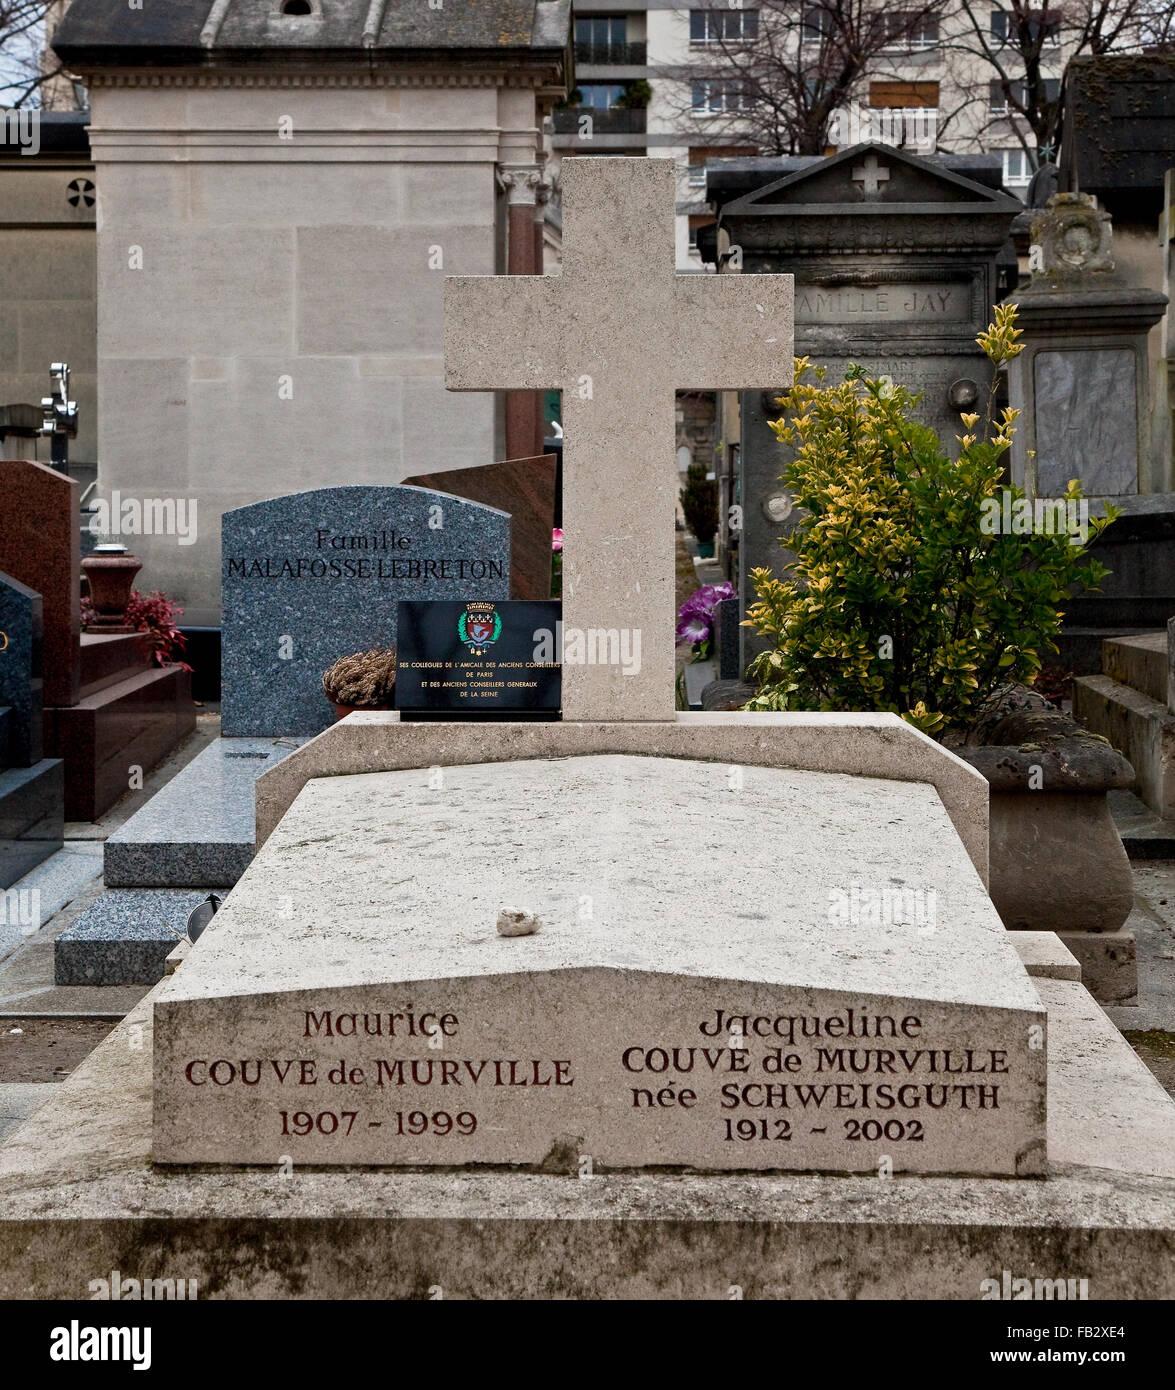 Paris, Friedhof Montparnasse begründet 1824 - Stock Image